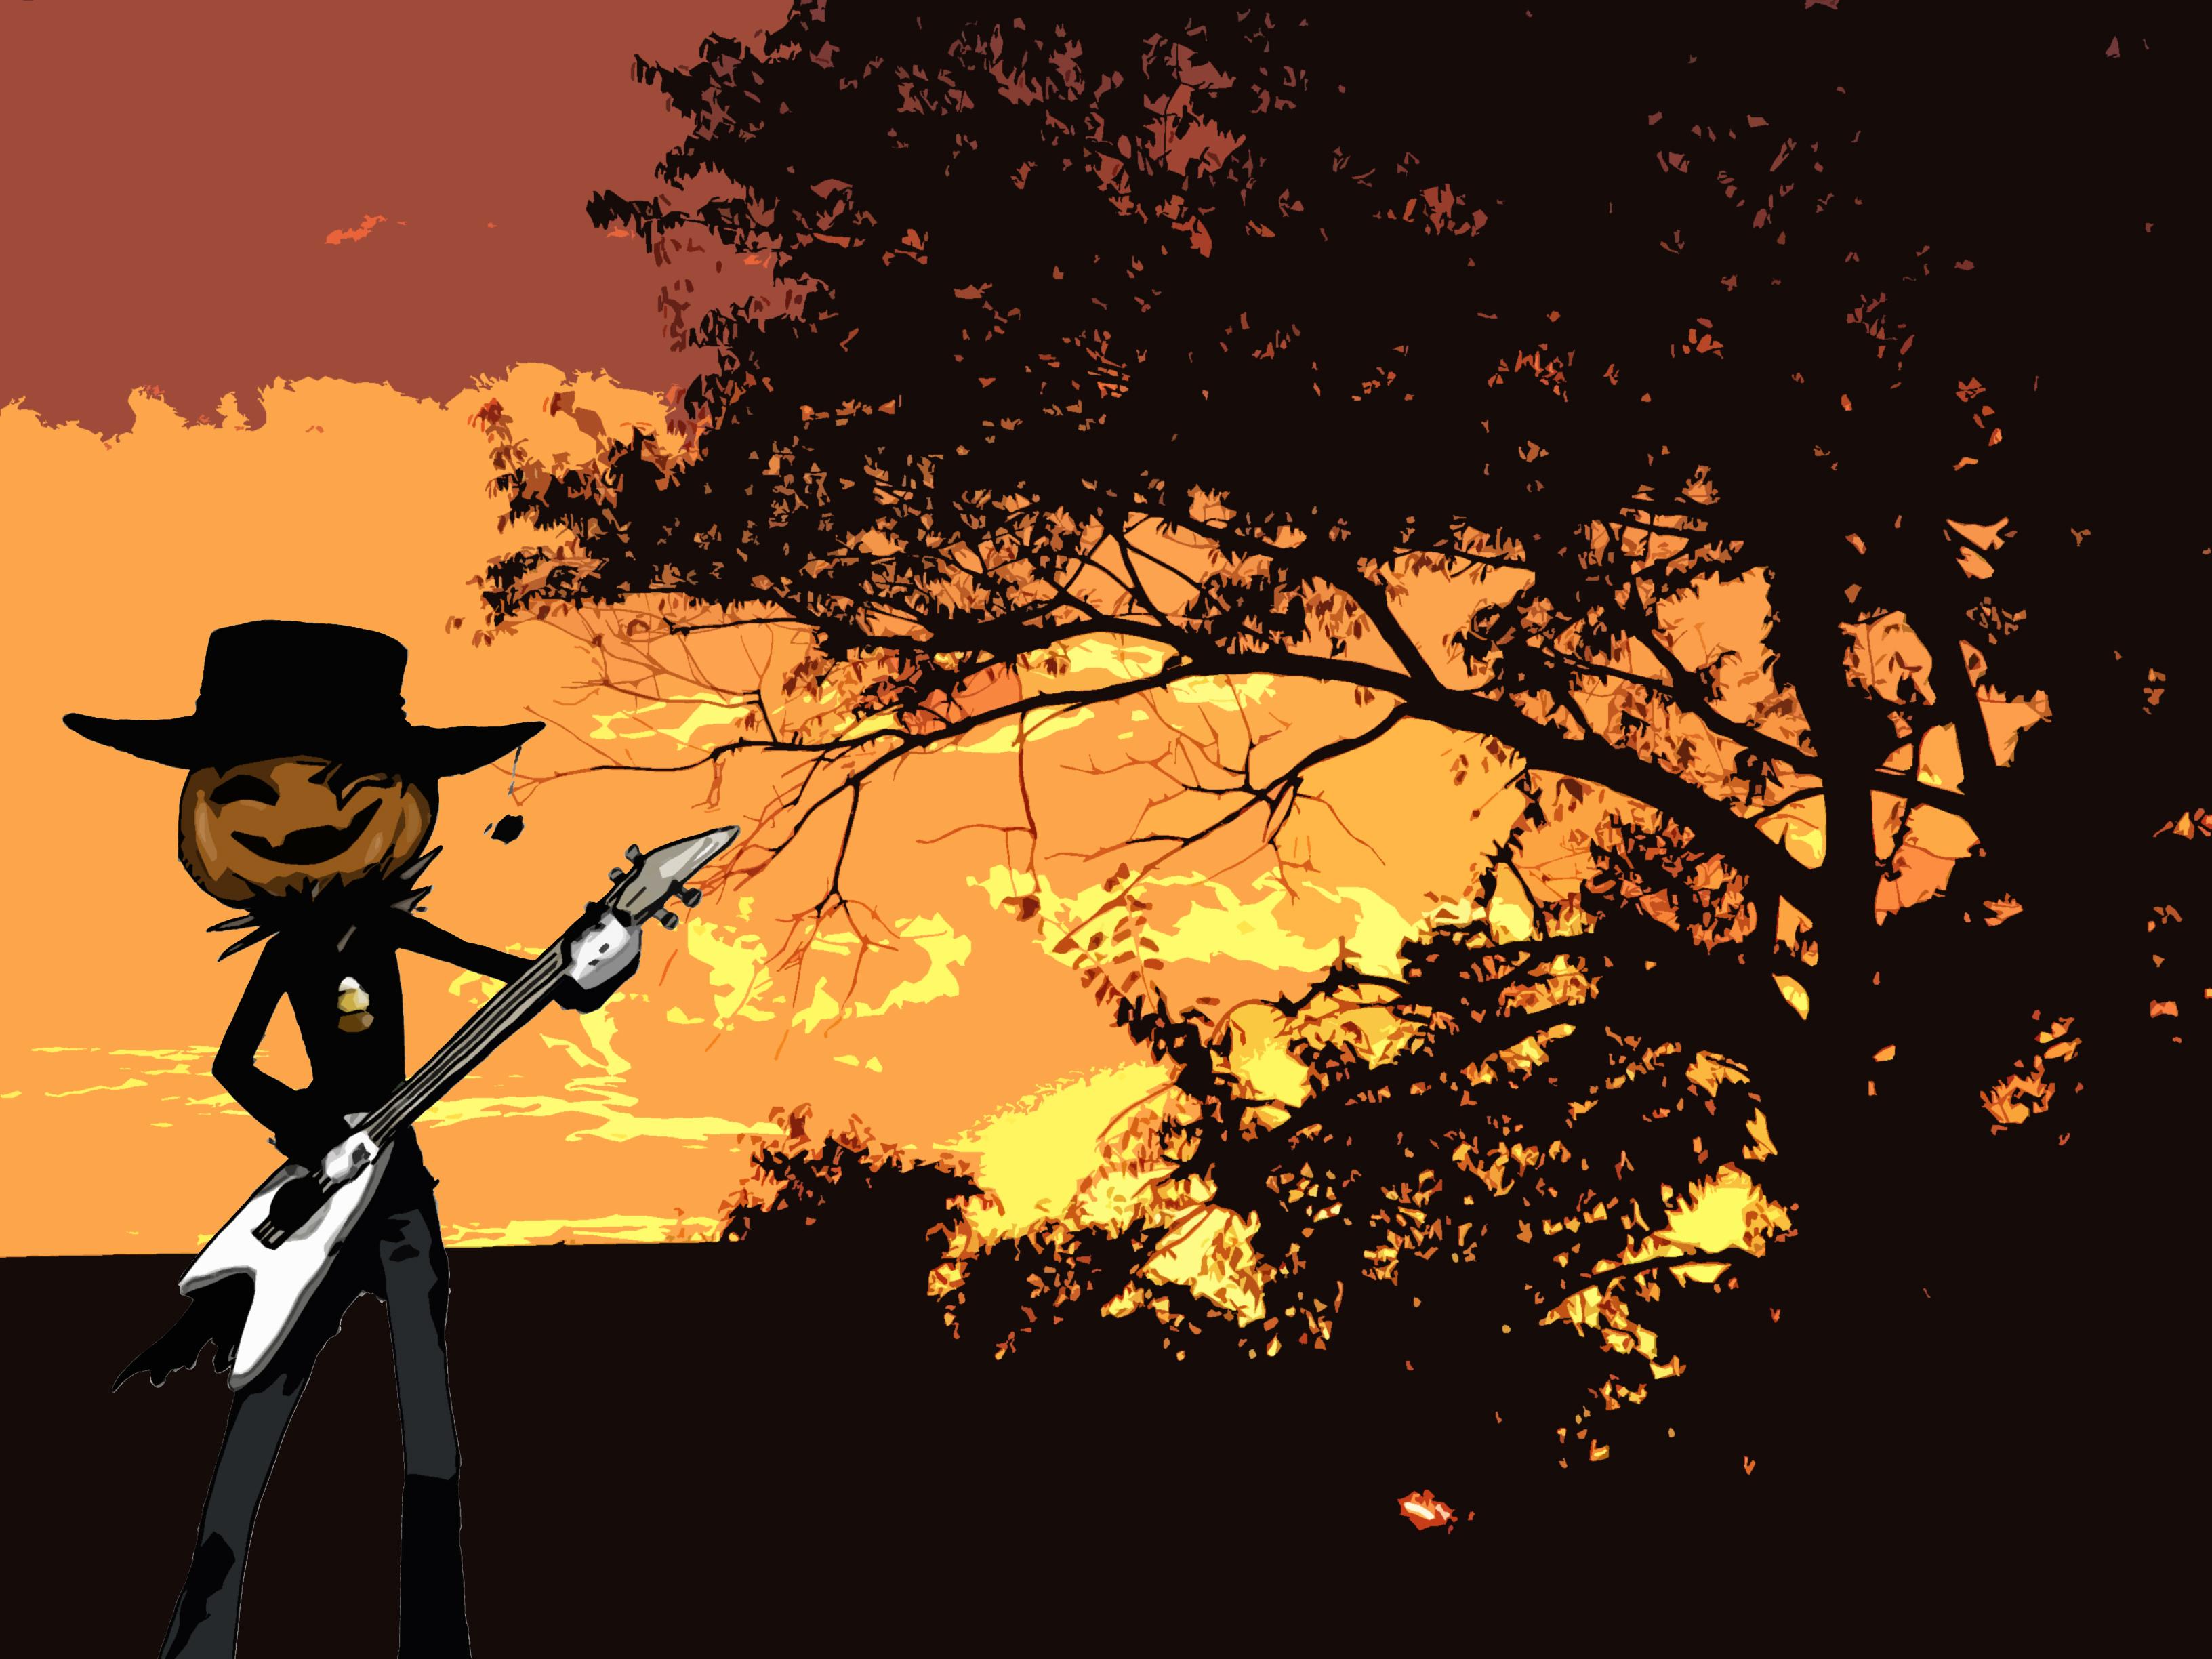 Holiday - Halloween  Jack-o'-lantern Guitar Wallpaper